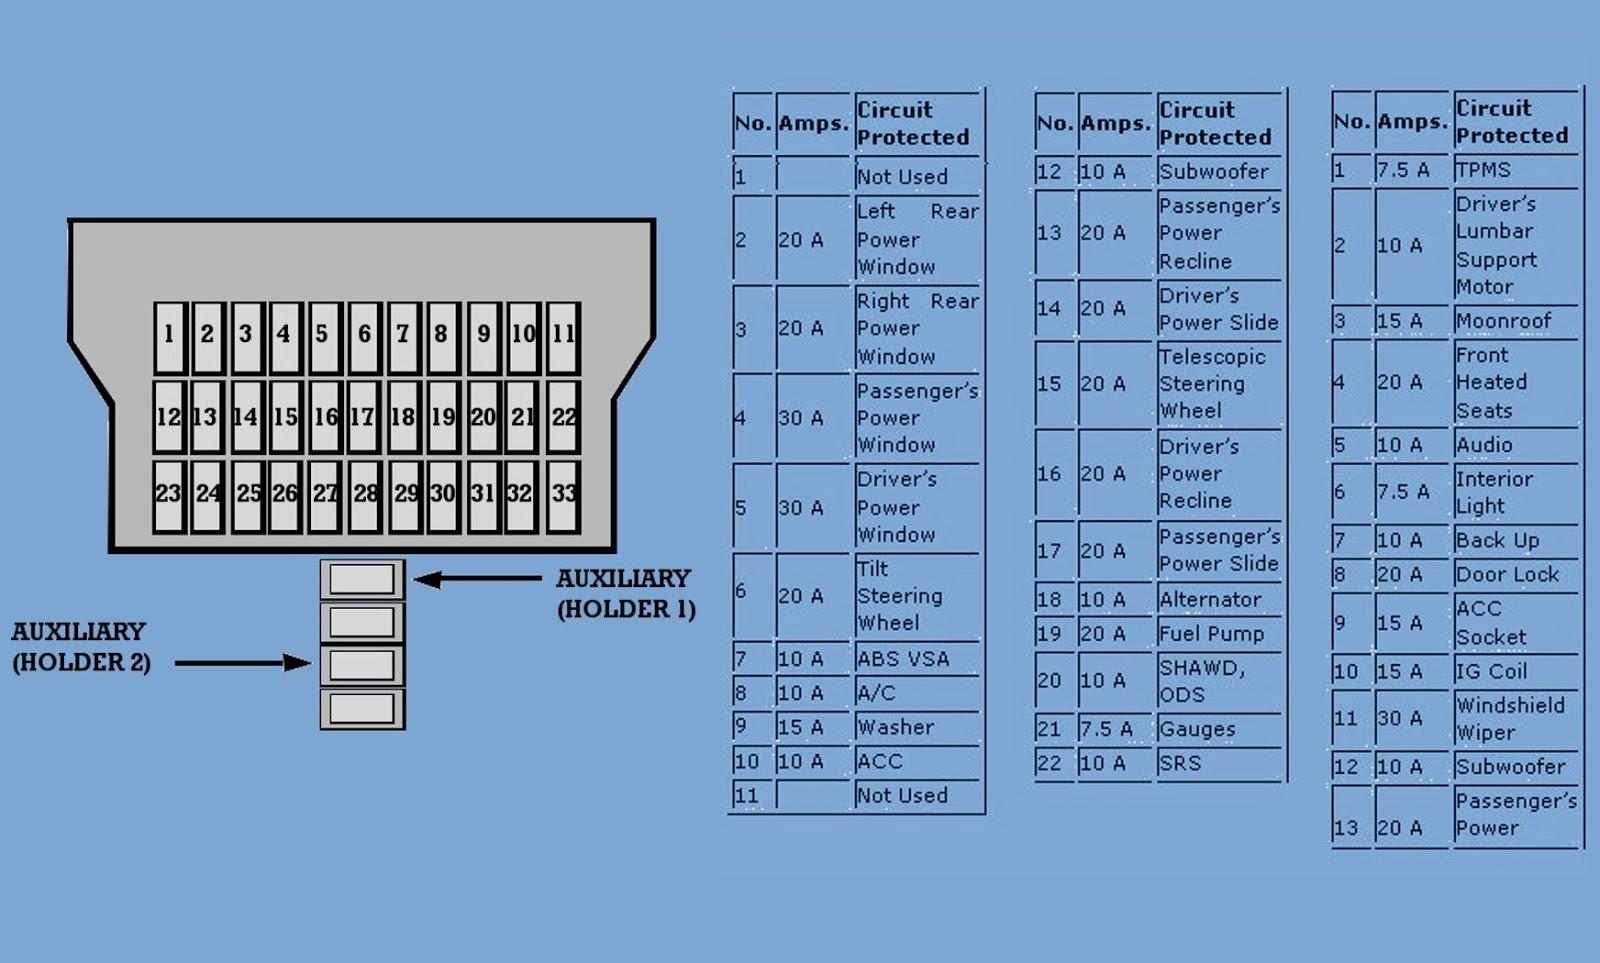 2010 Acura MDX Fuse Box Map and Diagram | Fuse Box Diagram ...